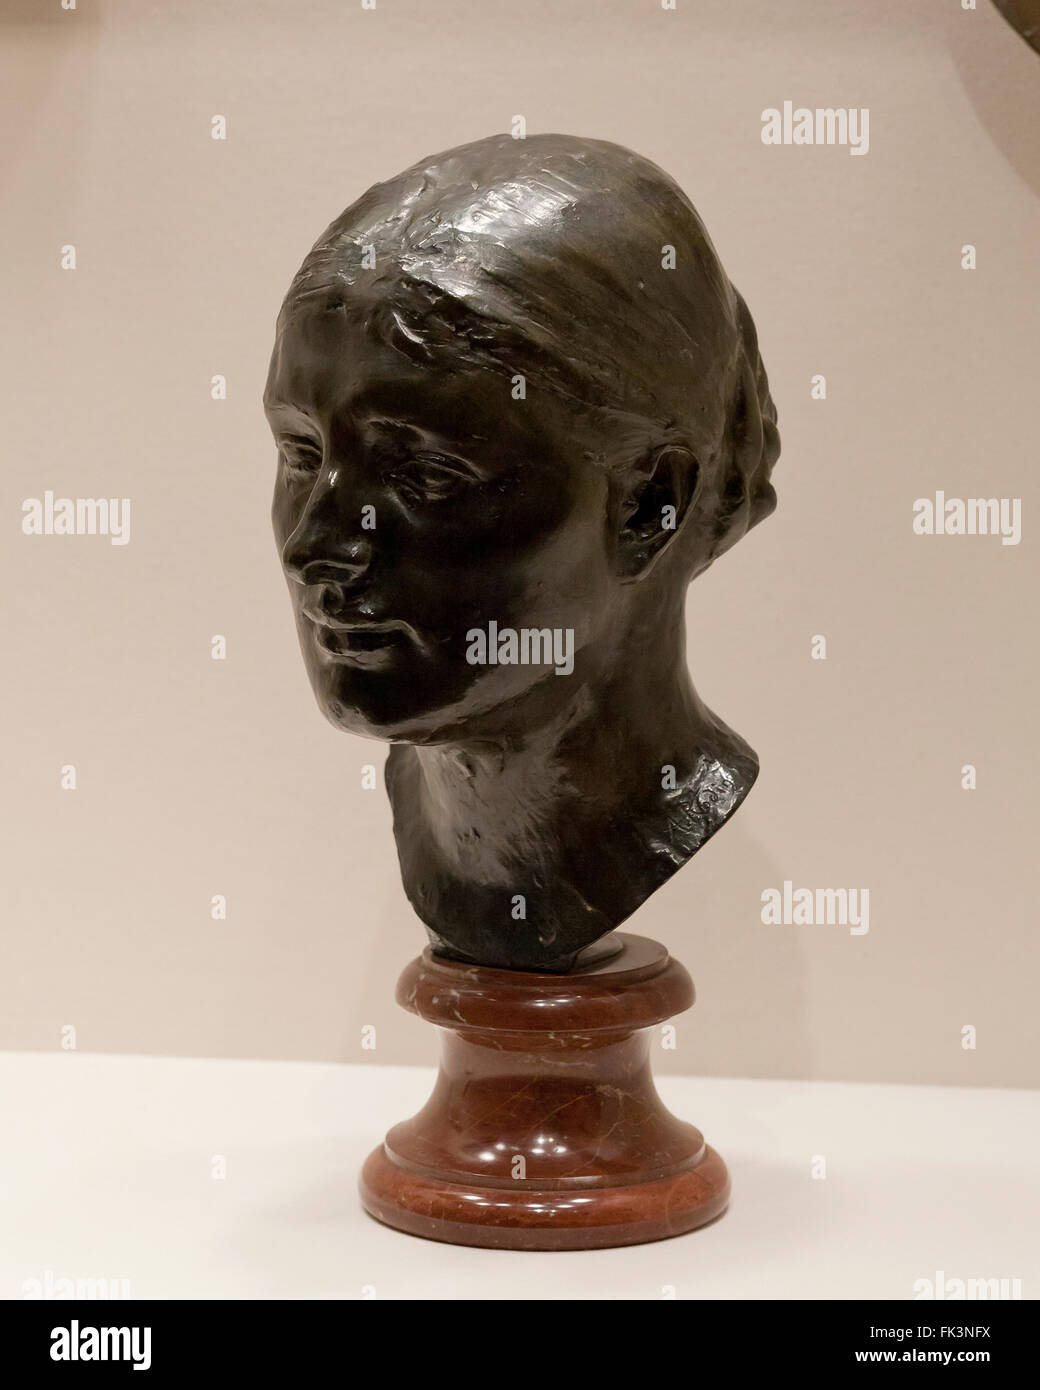 Kopf der Frau John Peter Russell (Marianna Mattiocco della Torre) von Auguste Rodin, ca. 1888 Stockbild